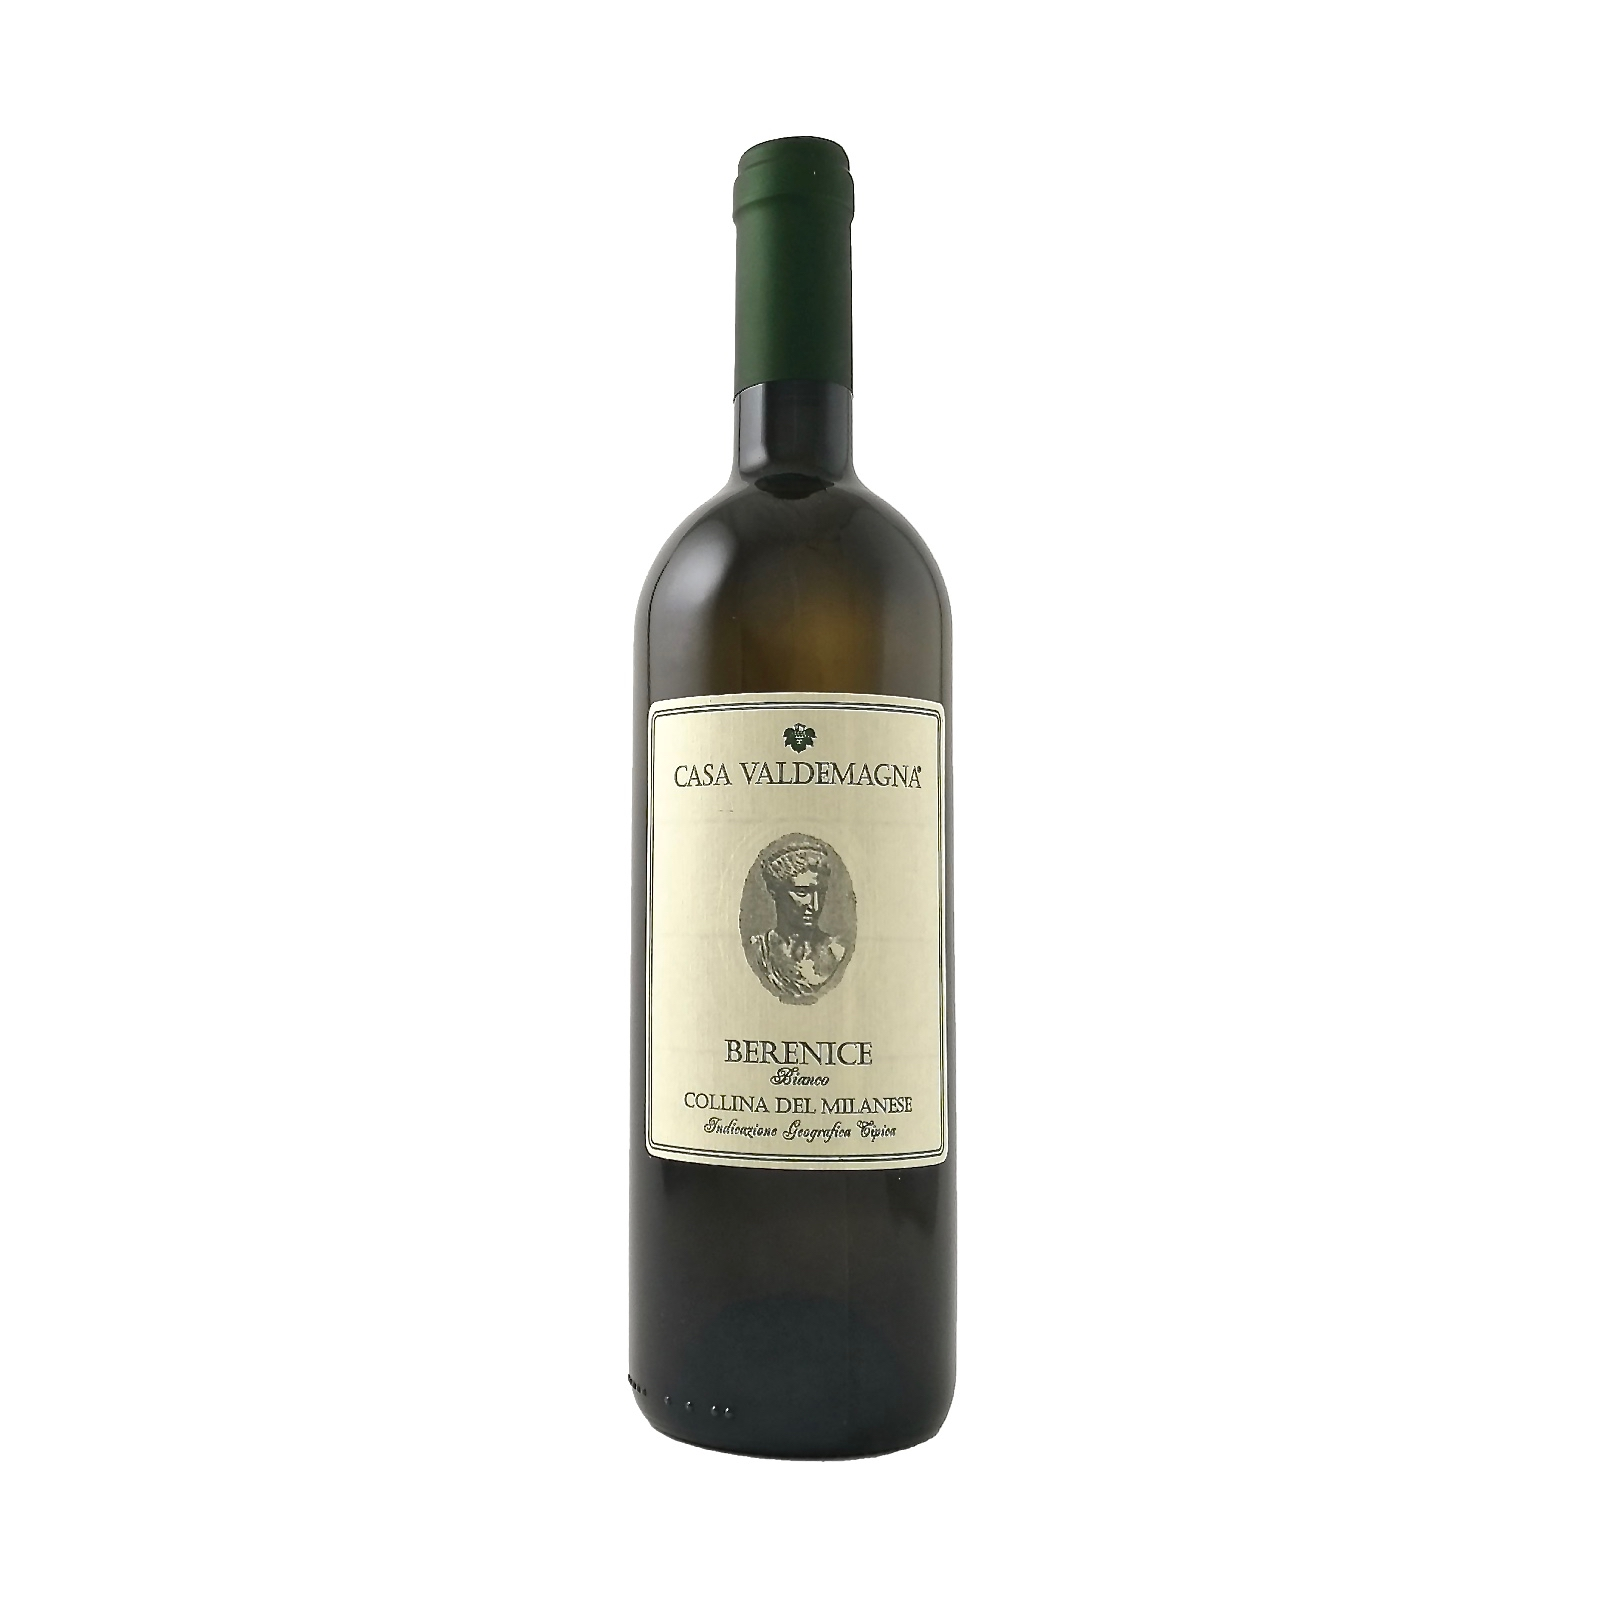 Casa Valdemagna Berenice vino bianco San Colombano al Lambro